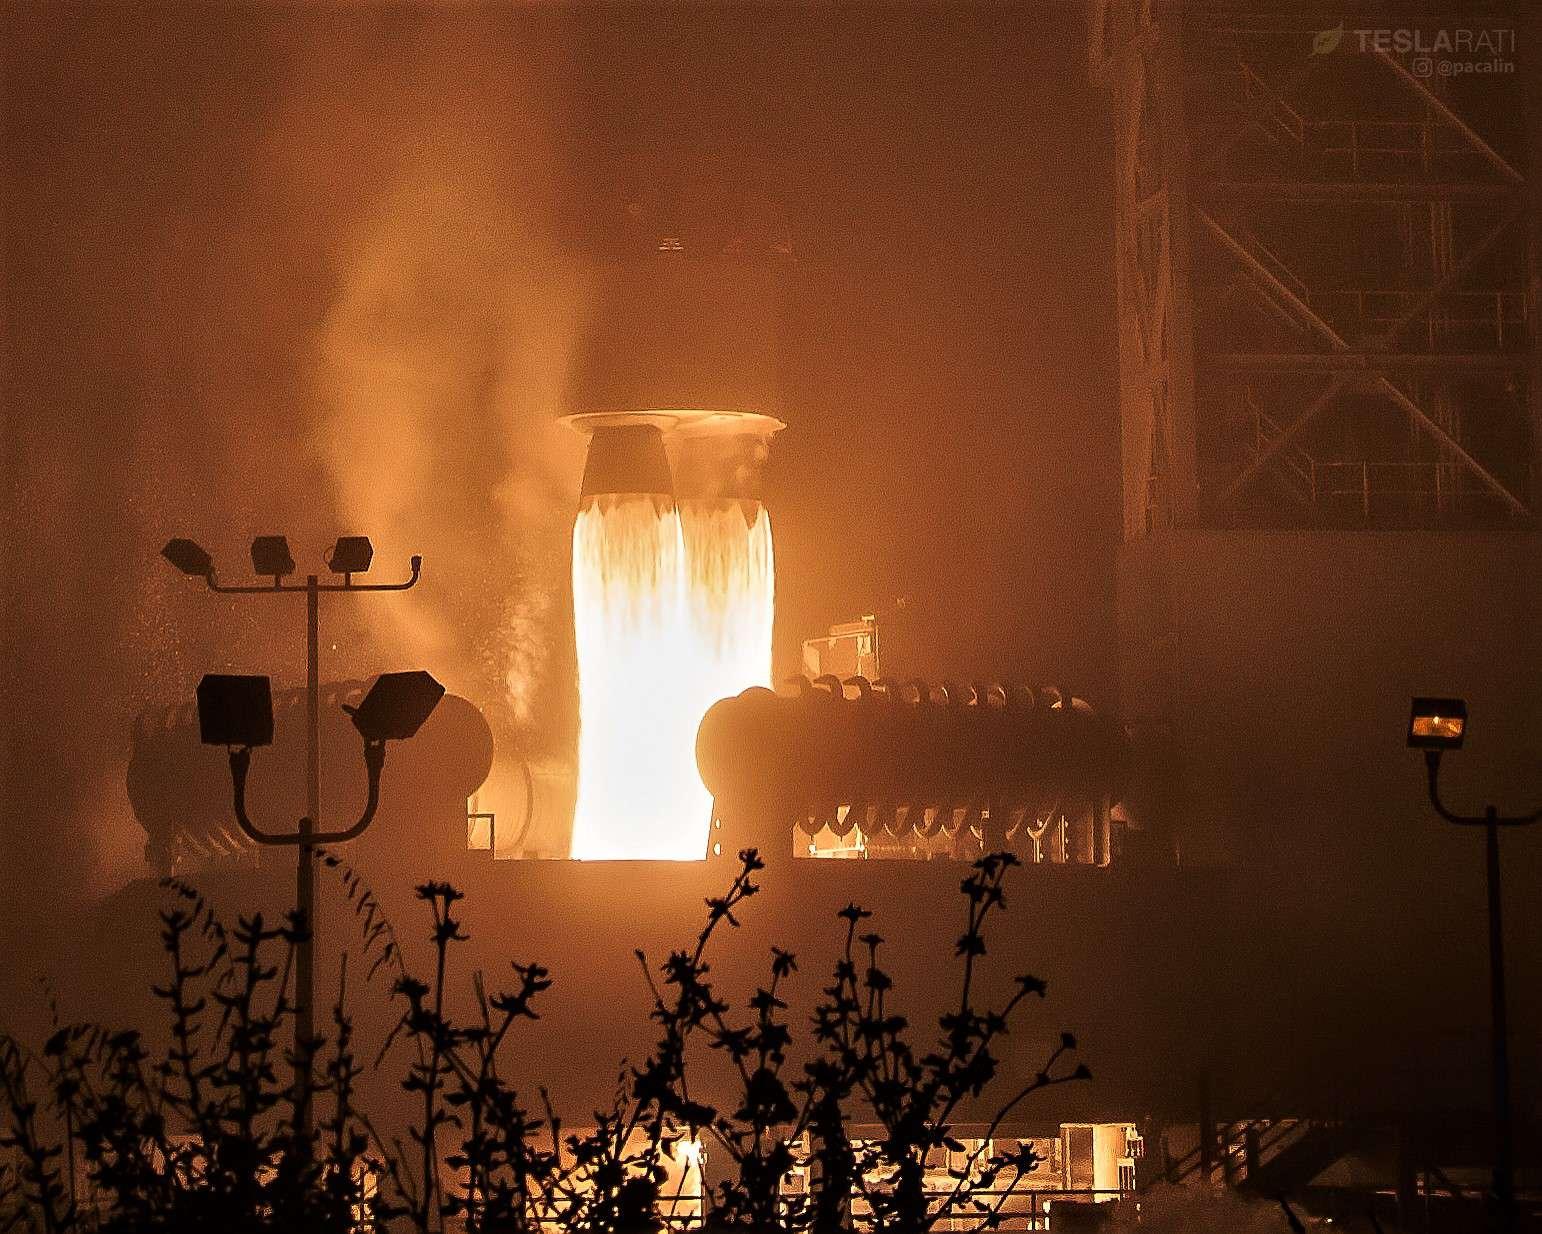 InSight launch Atlas 401 (Pauline Acalin)